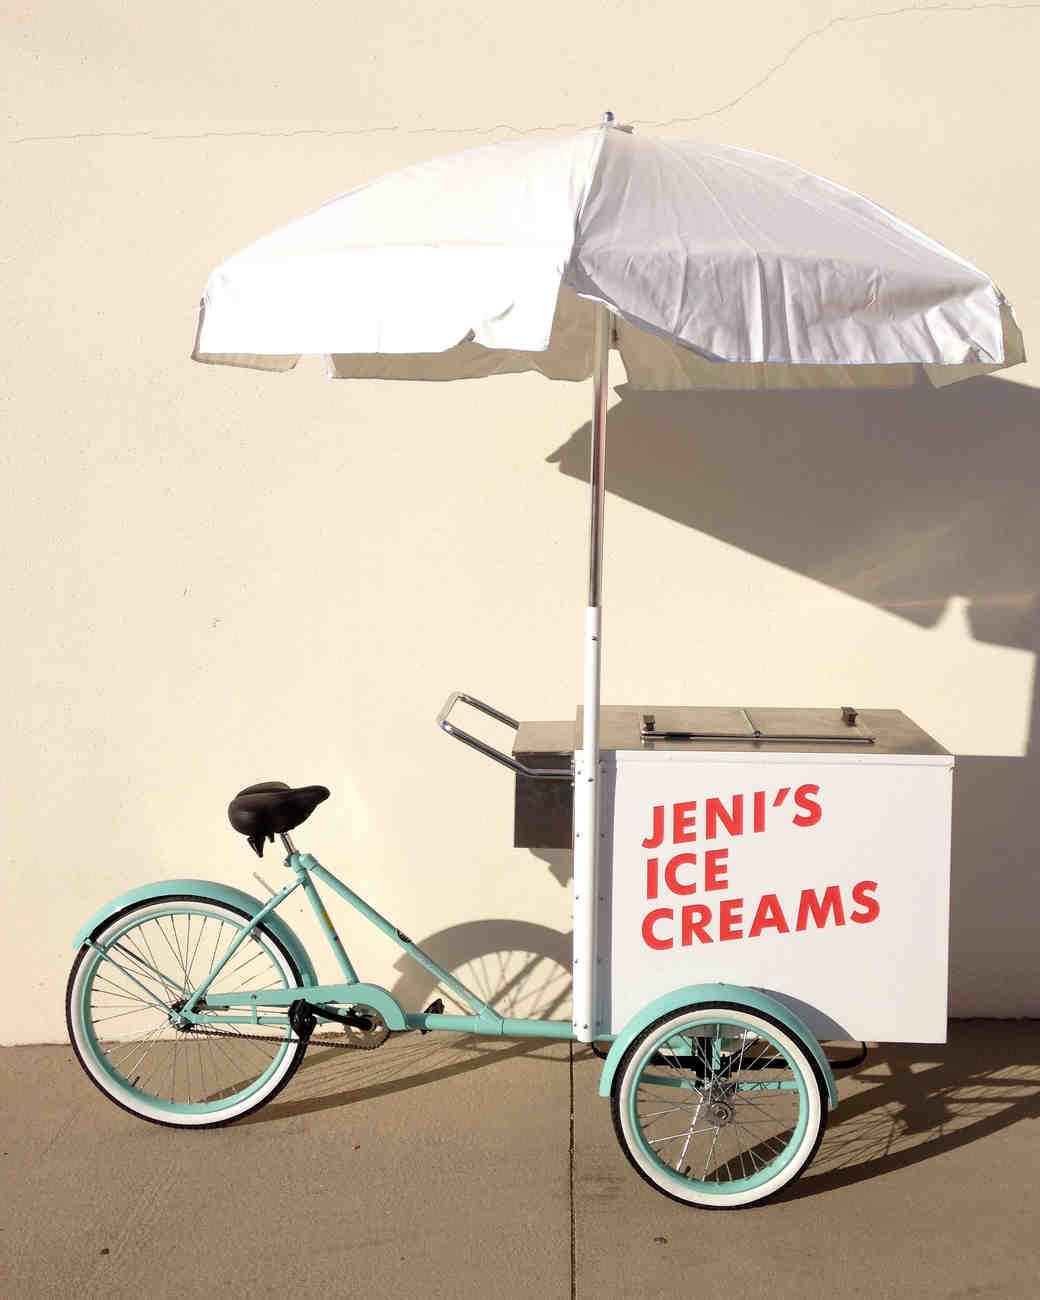 ice-cream-jenis-la-worksman-cycle-0116.jpg